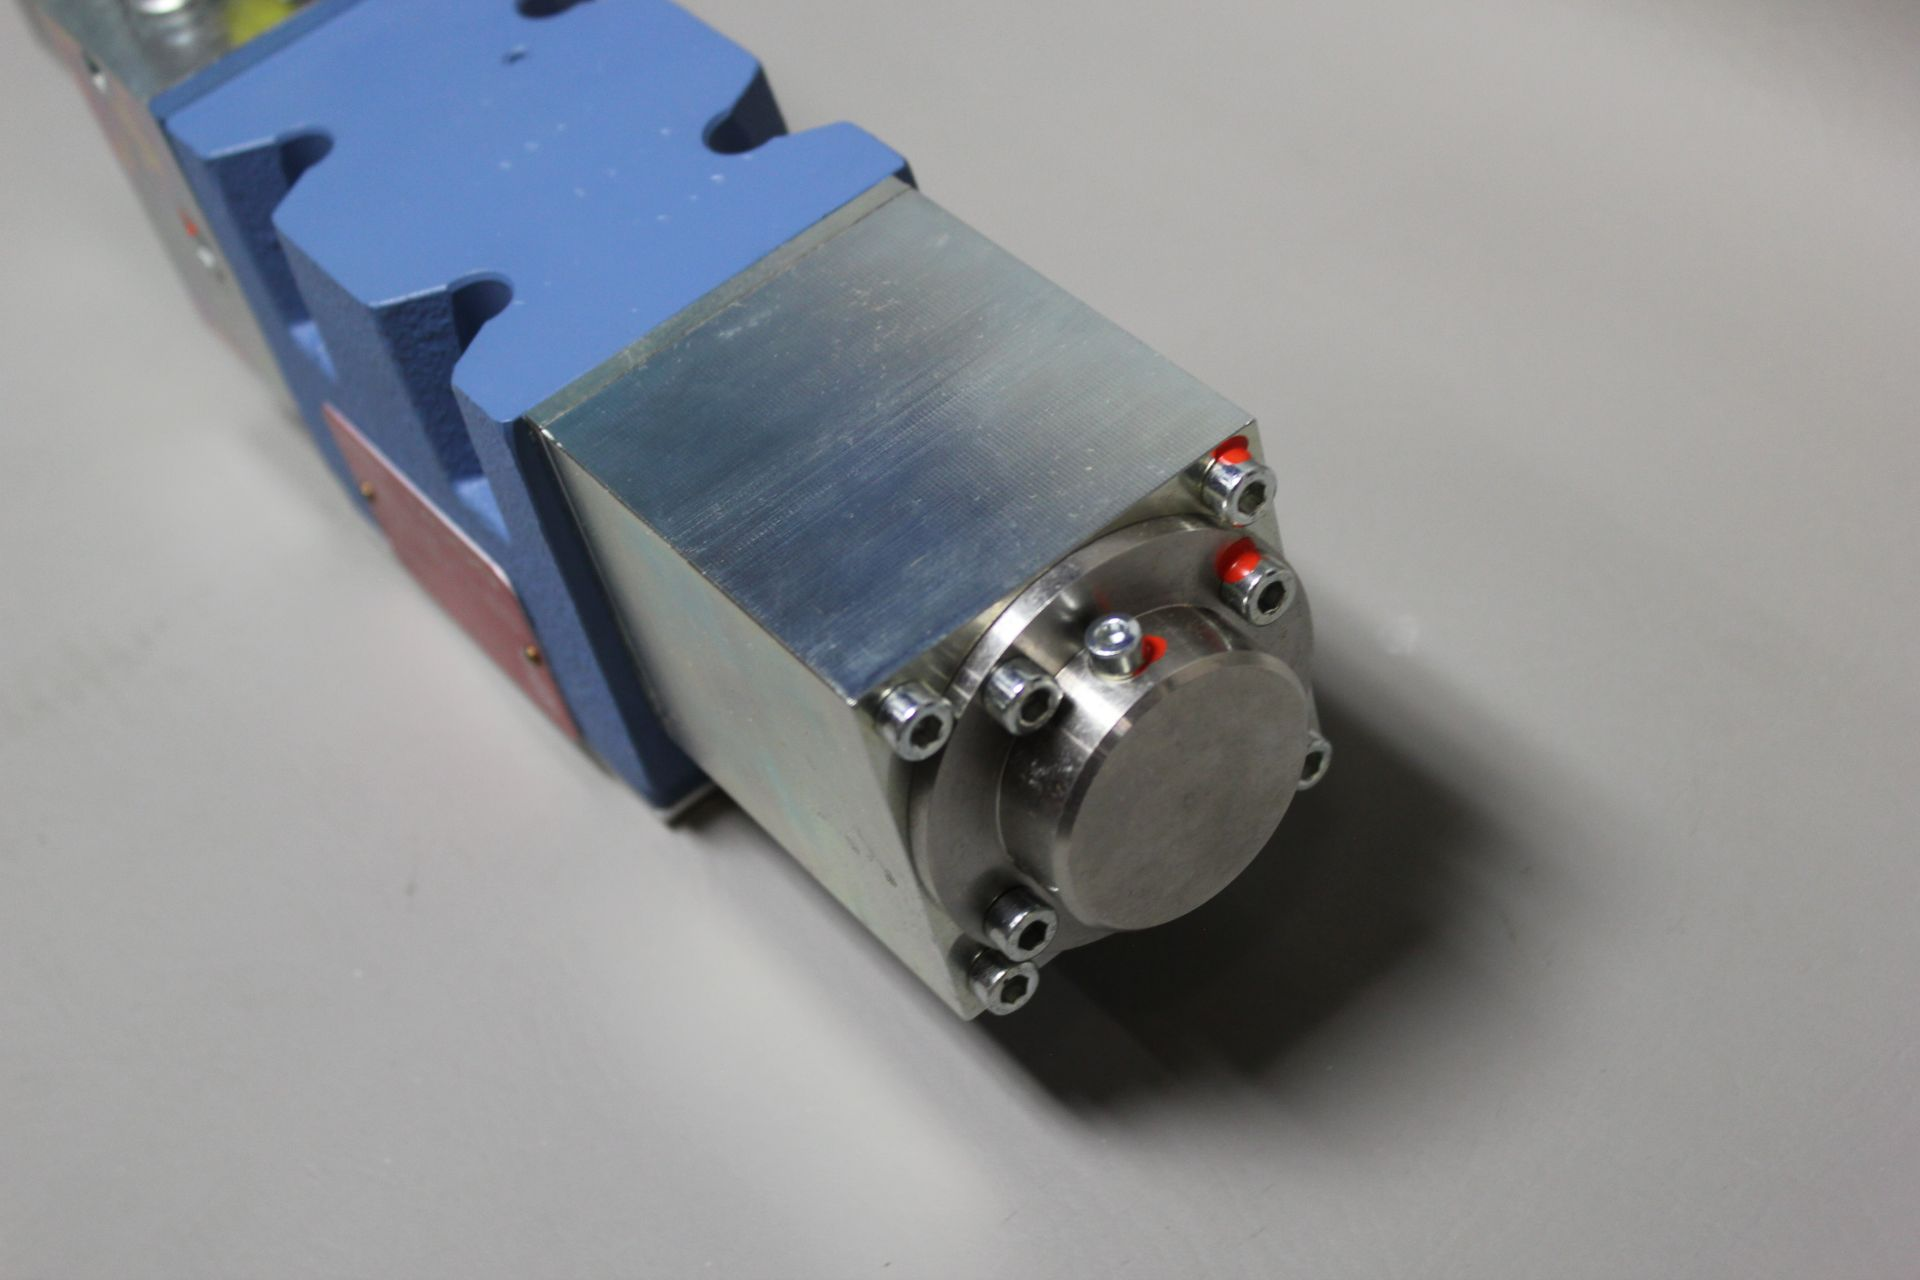 NEW MOOG DIRECT DRIVE DIGITAL CONTROL HYDRAULIC SERVO VALVE - Image 8 of 15